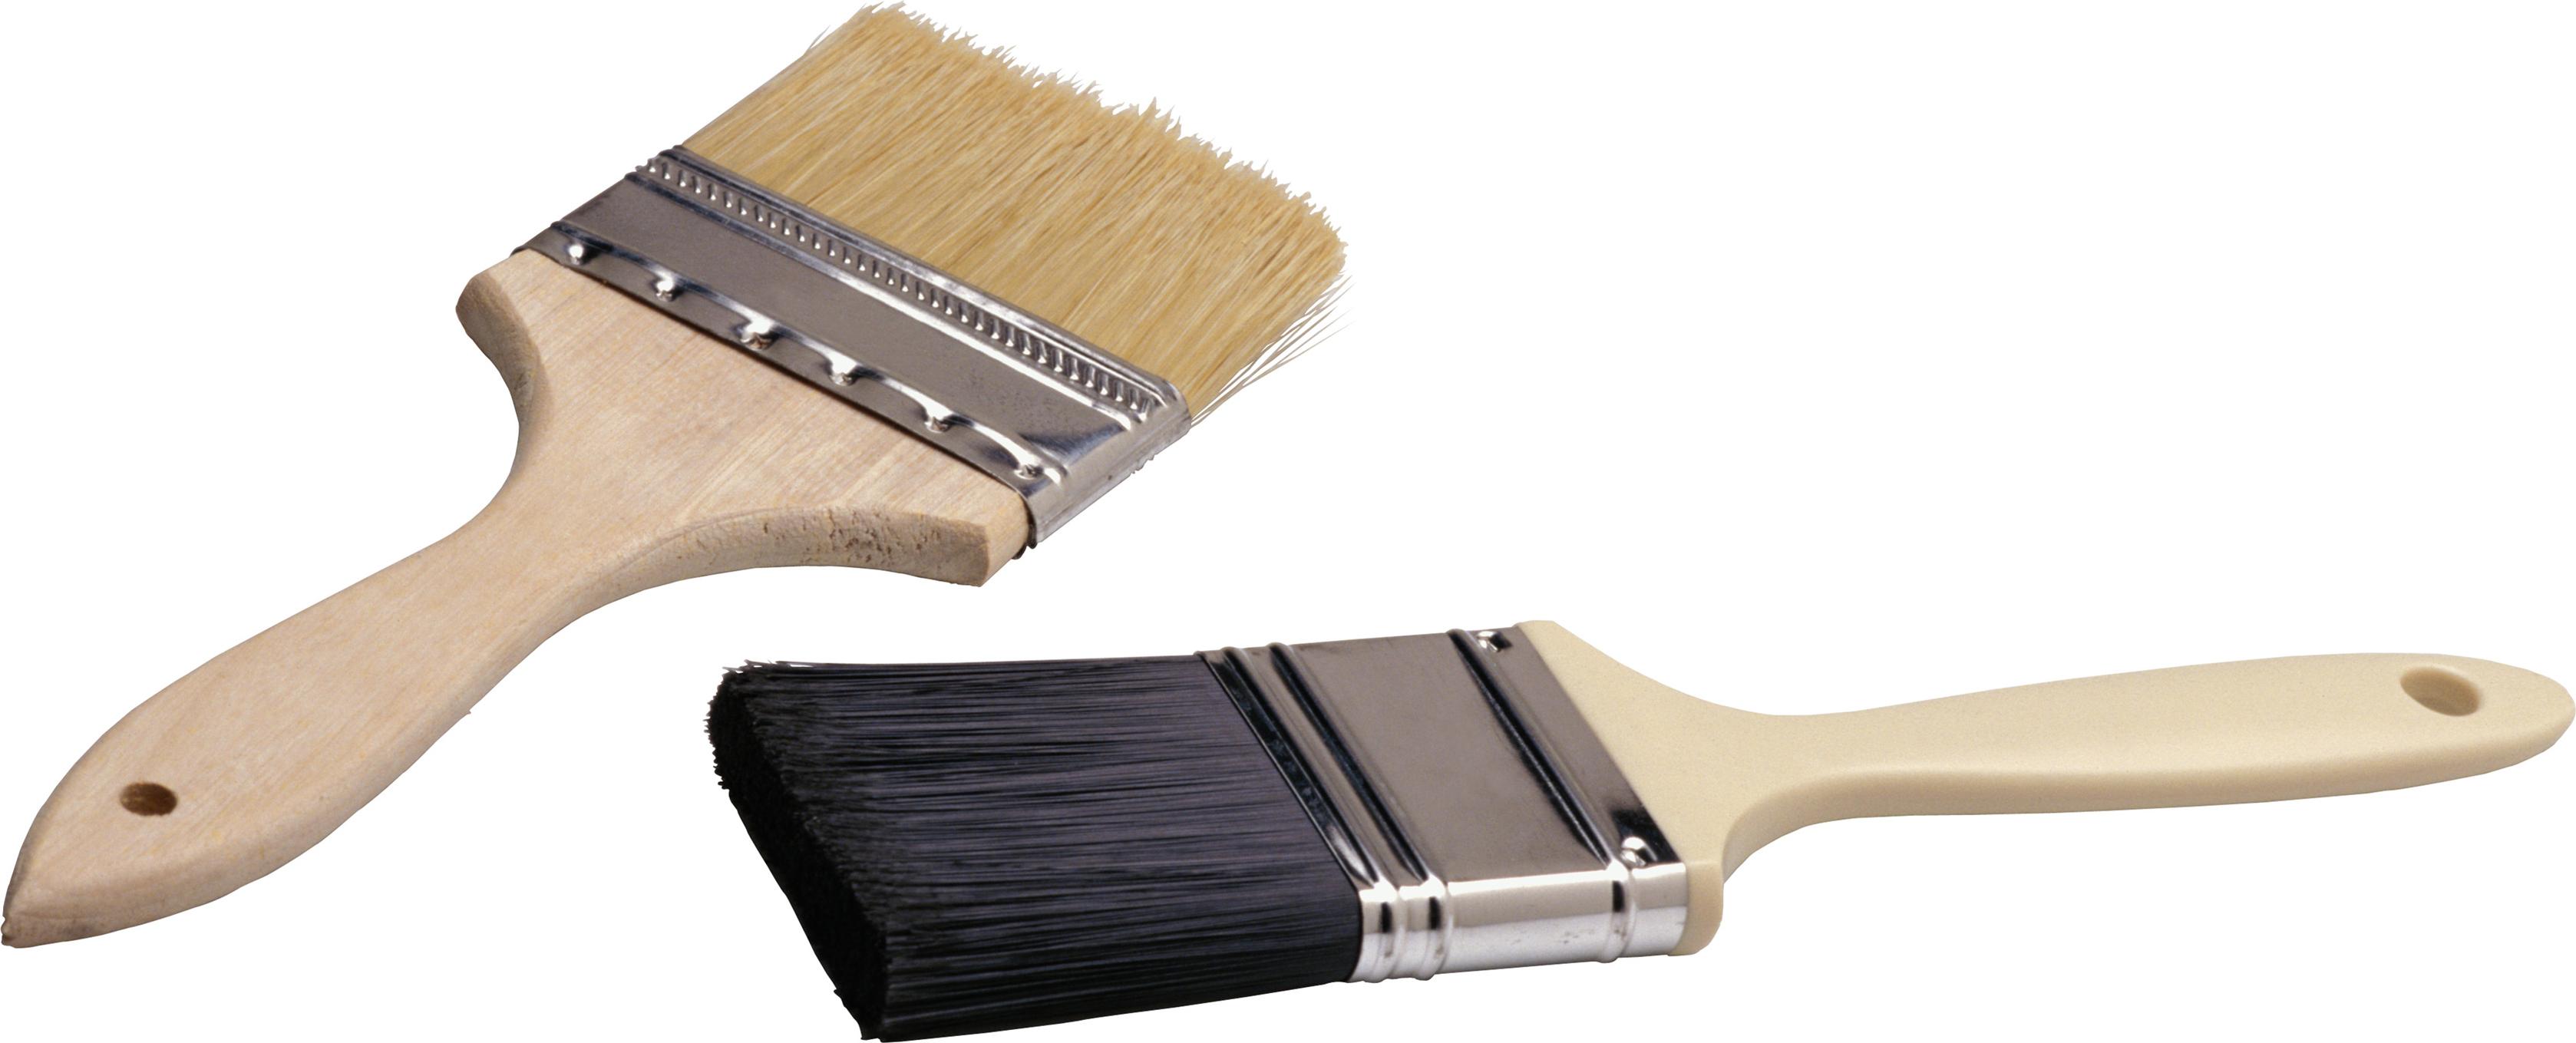 Paint Brush PNG Image - PurePNG   Free transparent CC0 PNG ...